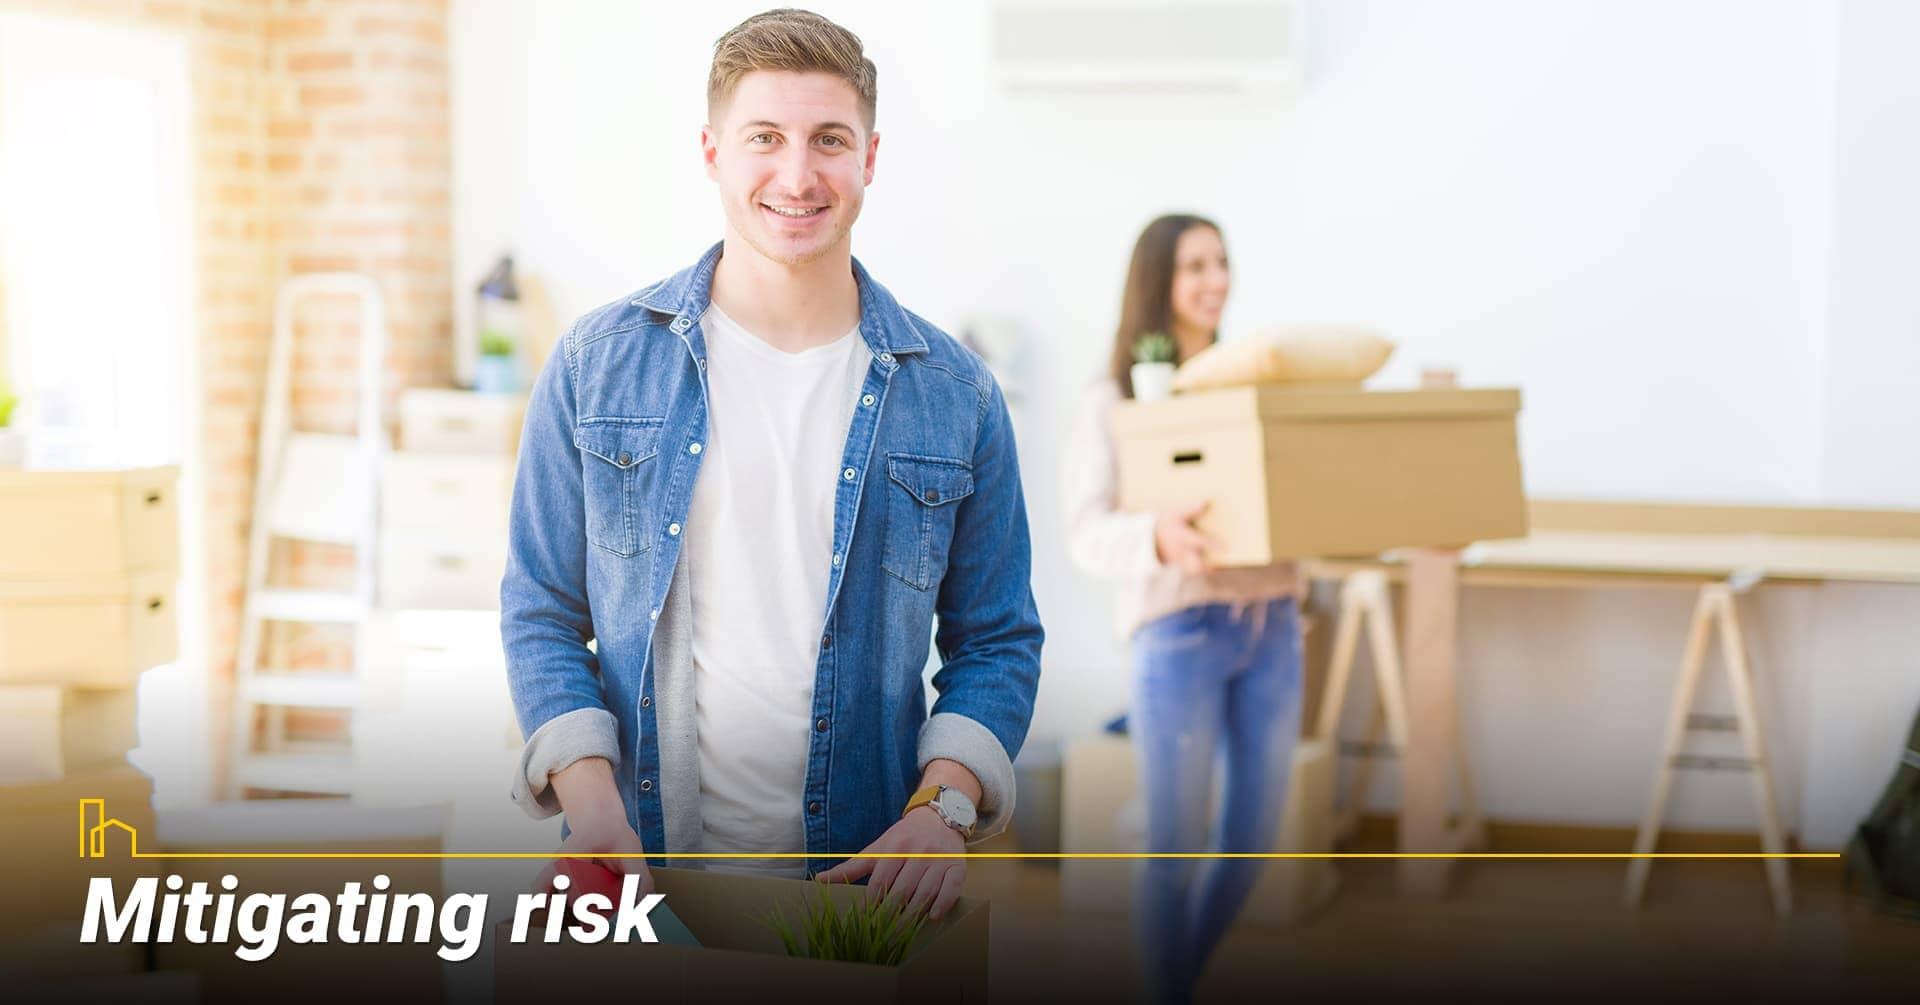 Mitigating risk, ways to avoid risks